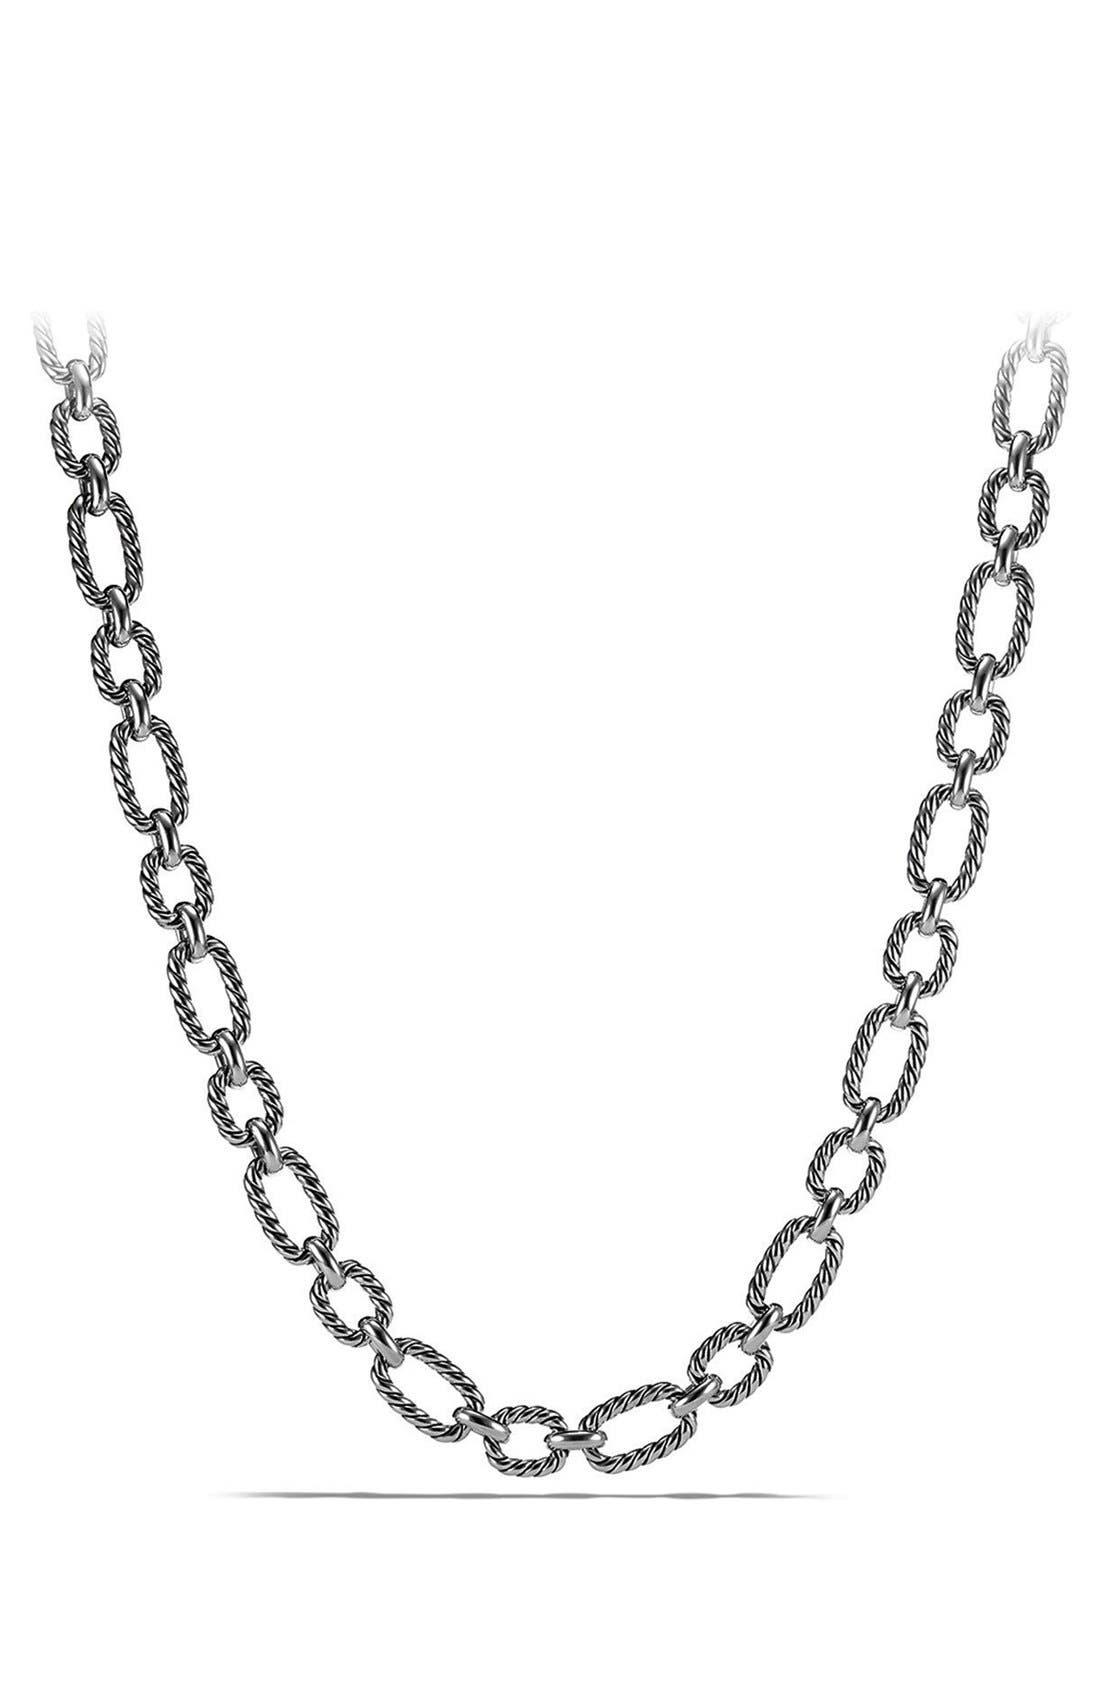 Main Image - David Yurman Cushion Link Necklace with Blue Sapphires